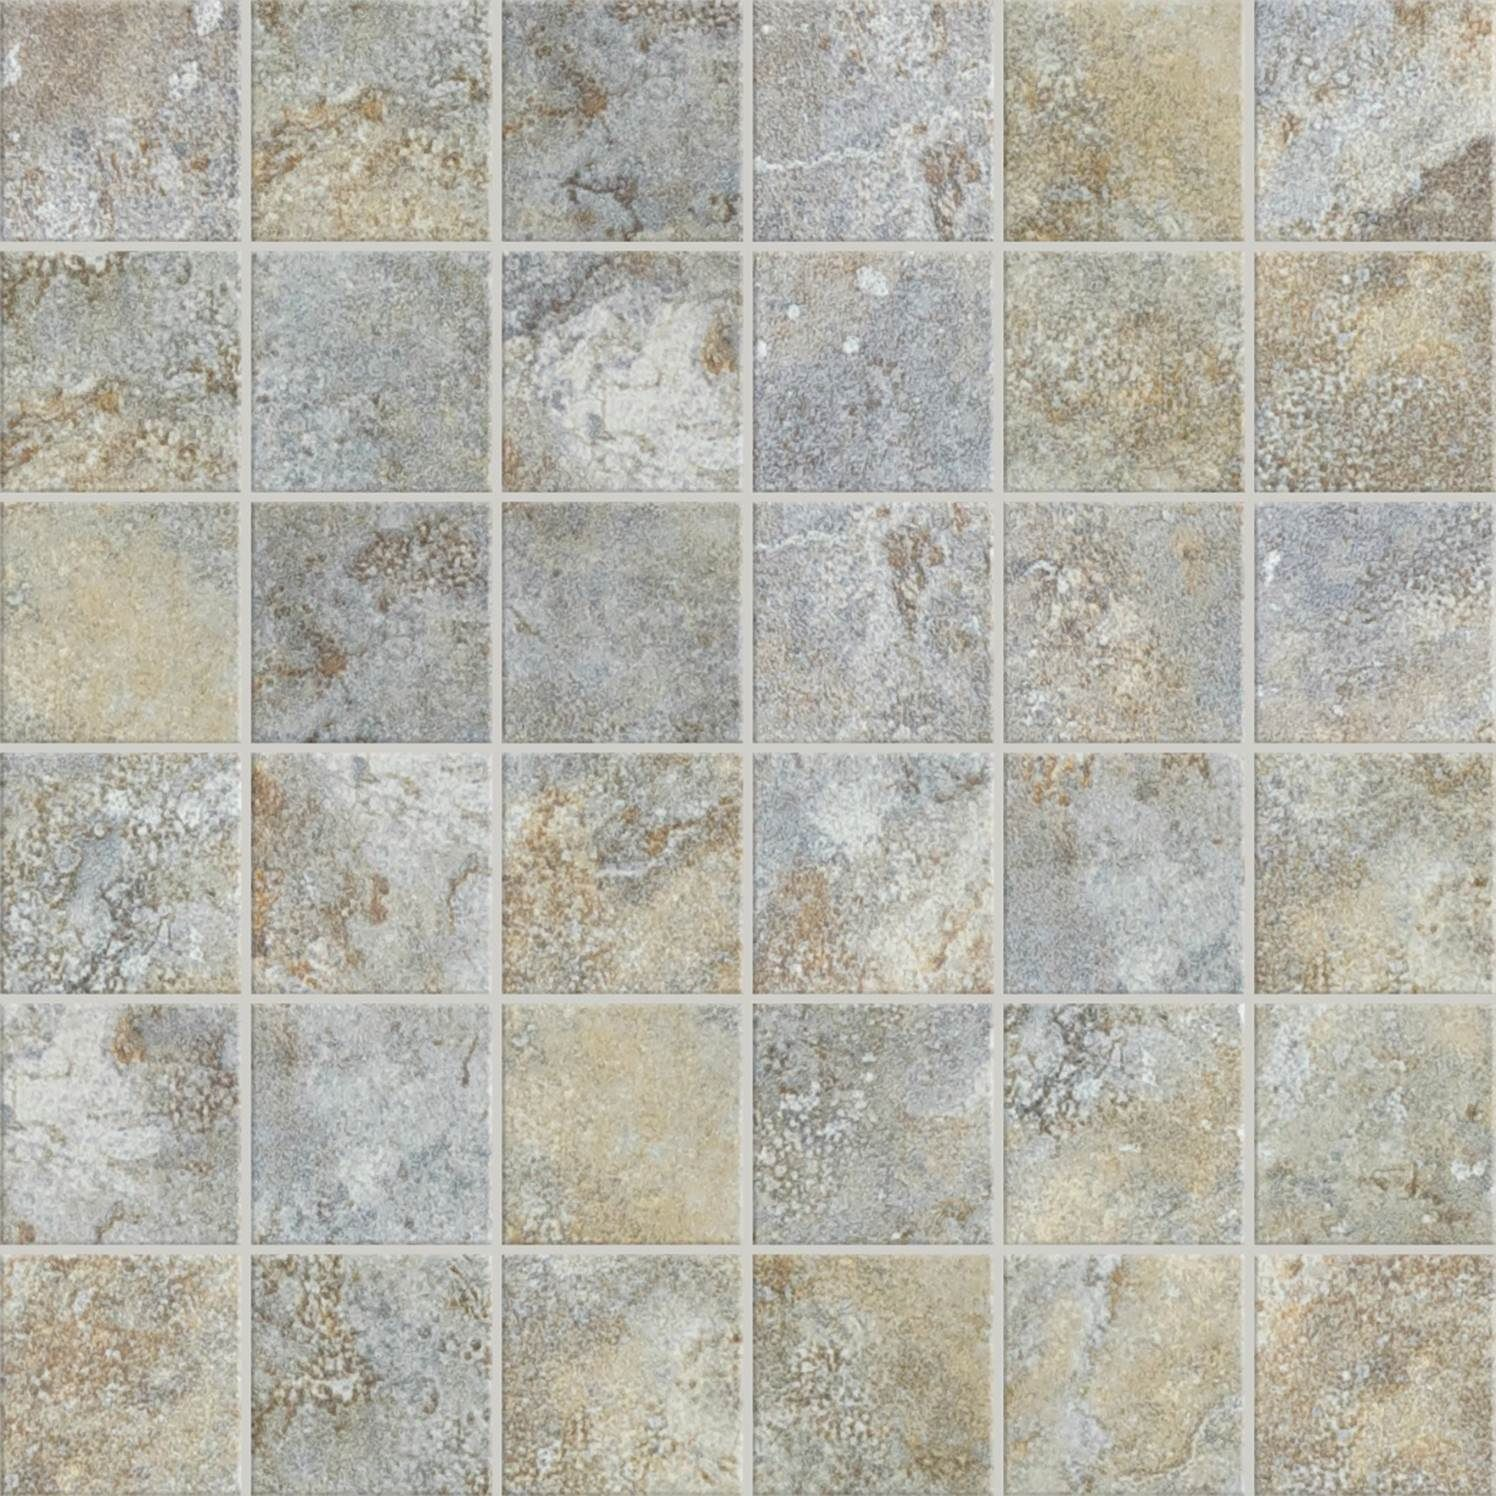 Anatolia Tile Portofino 2x2 Classic Mosaic Classic Mosaic Mosaic Portofino